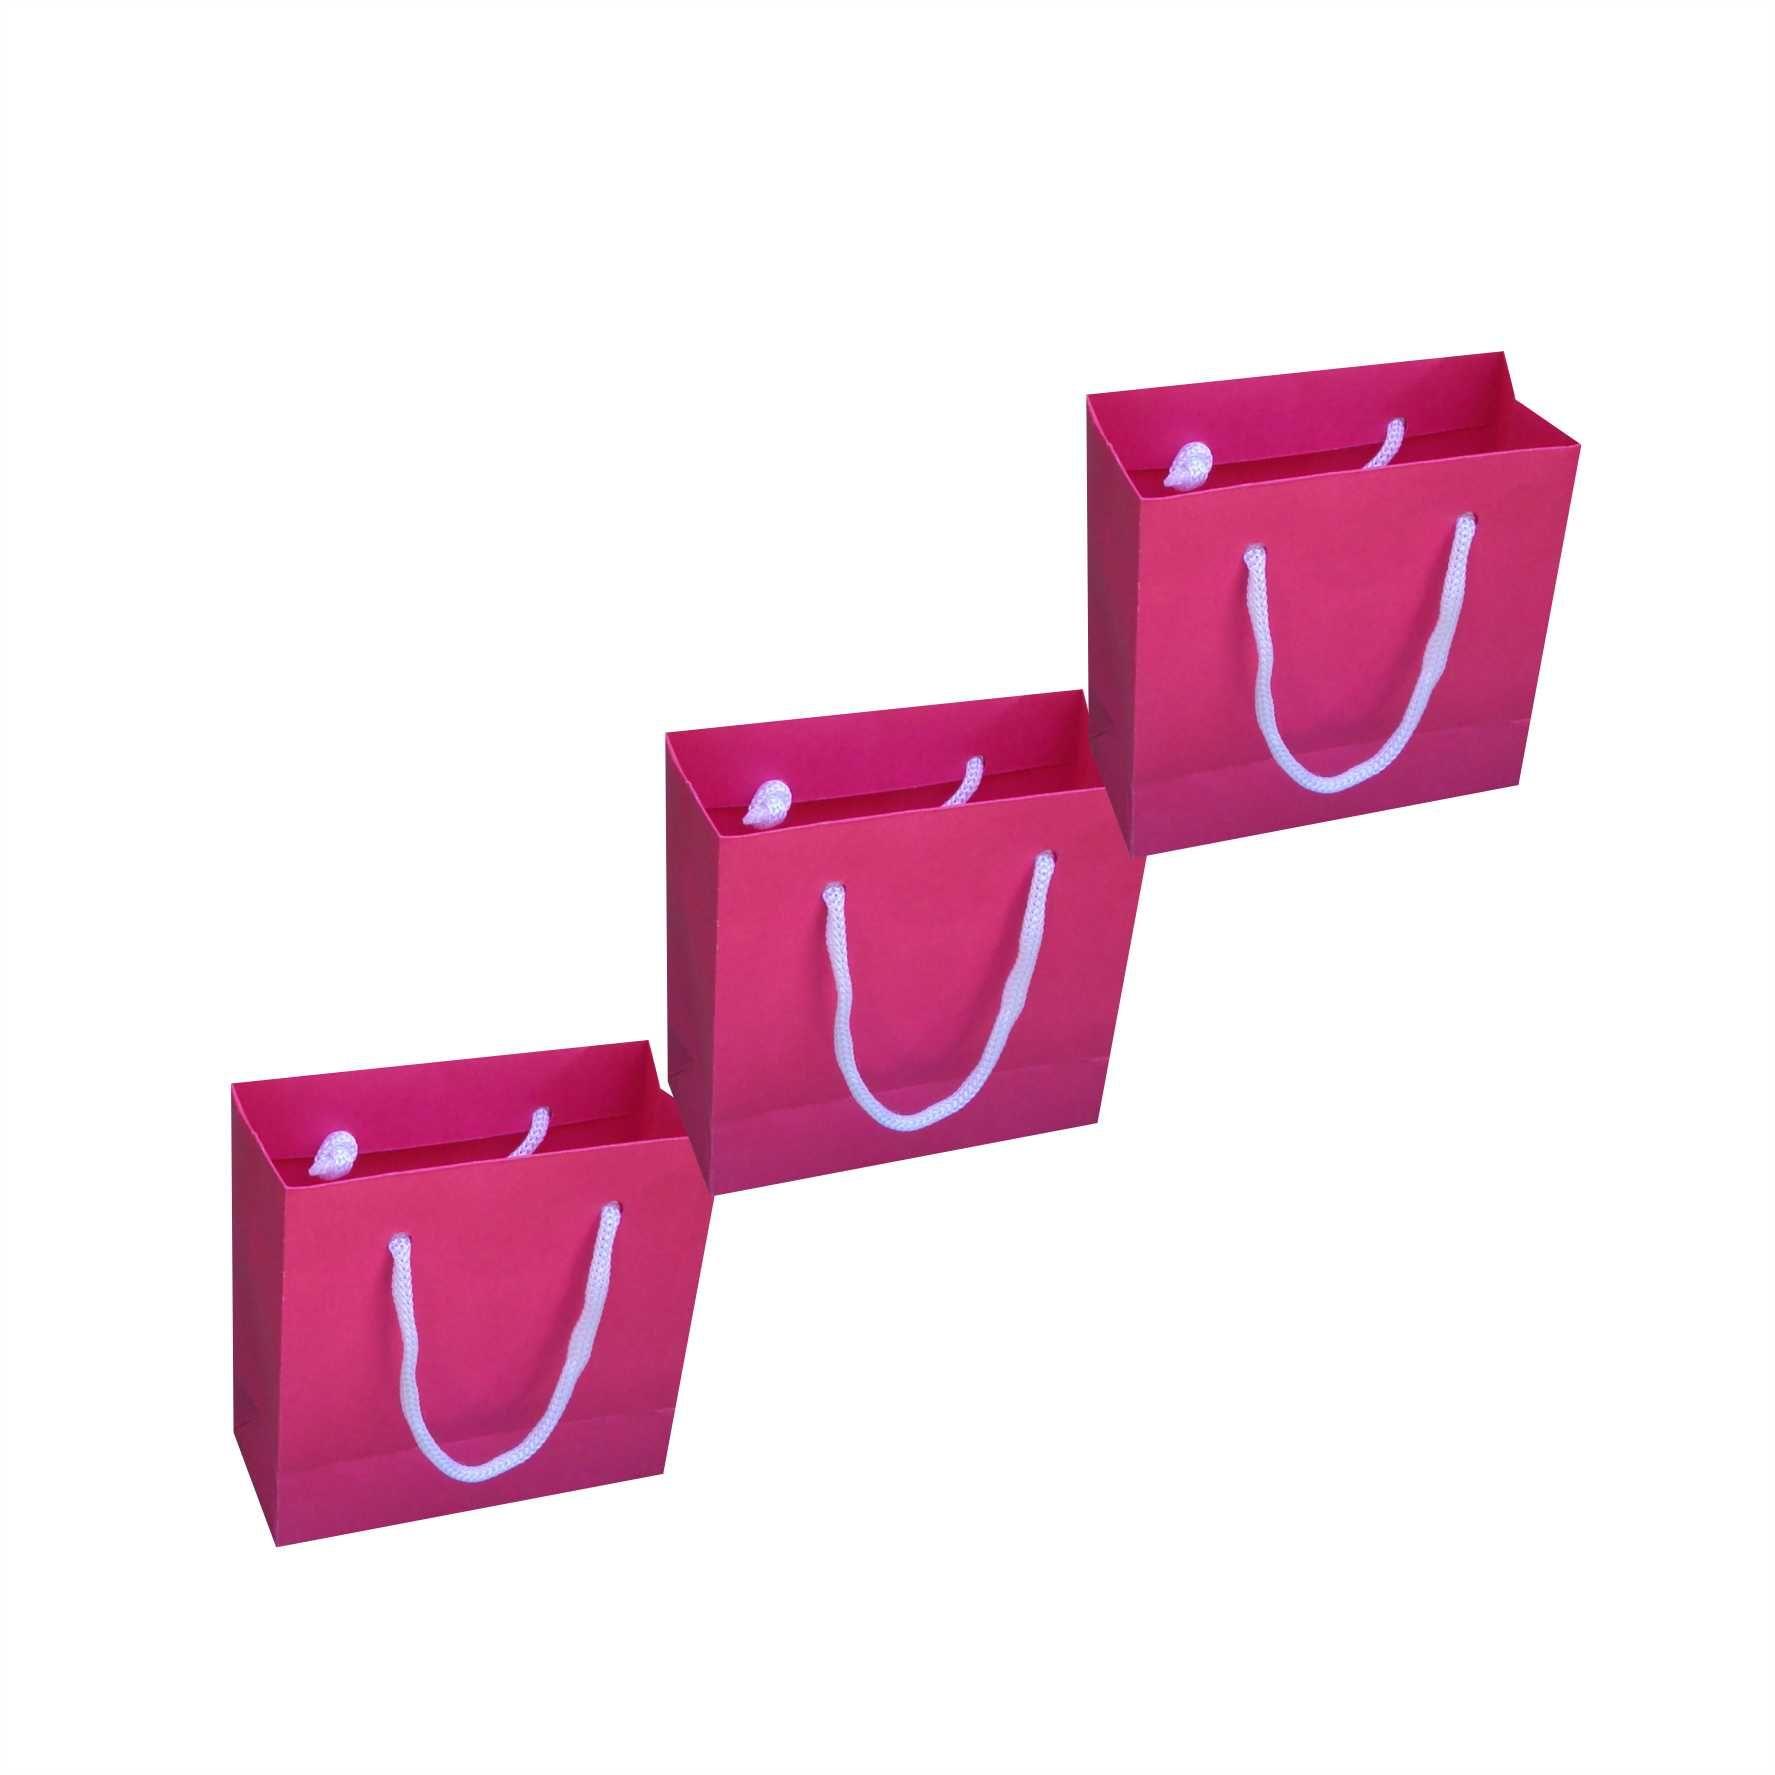 Sacola de papel mini (10x10x4,5 cm) - Pink - 10 unidades